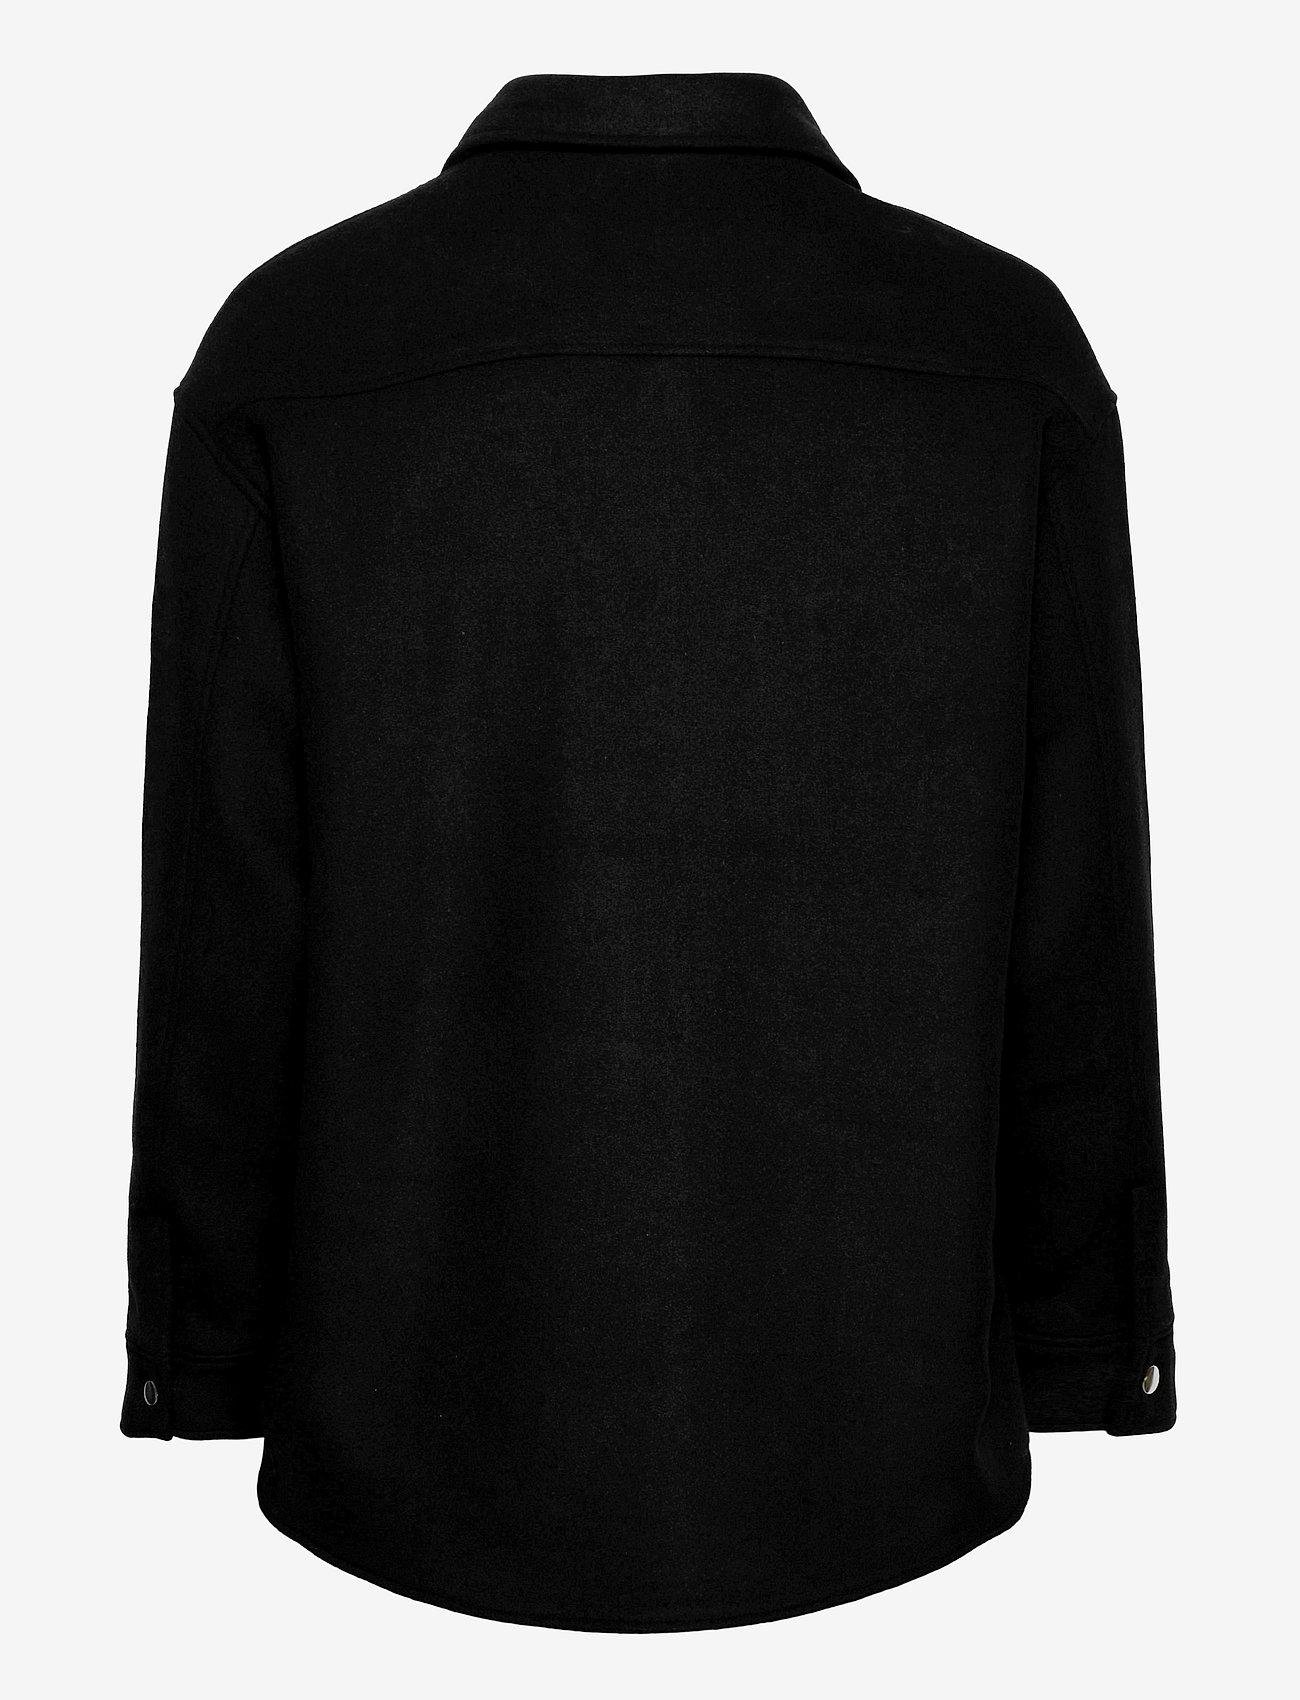 Selected Femme - SLFTESSA WOOL SHIRT JACKET - wool jackets - black - 1